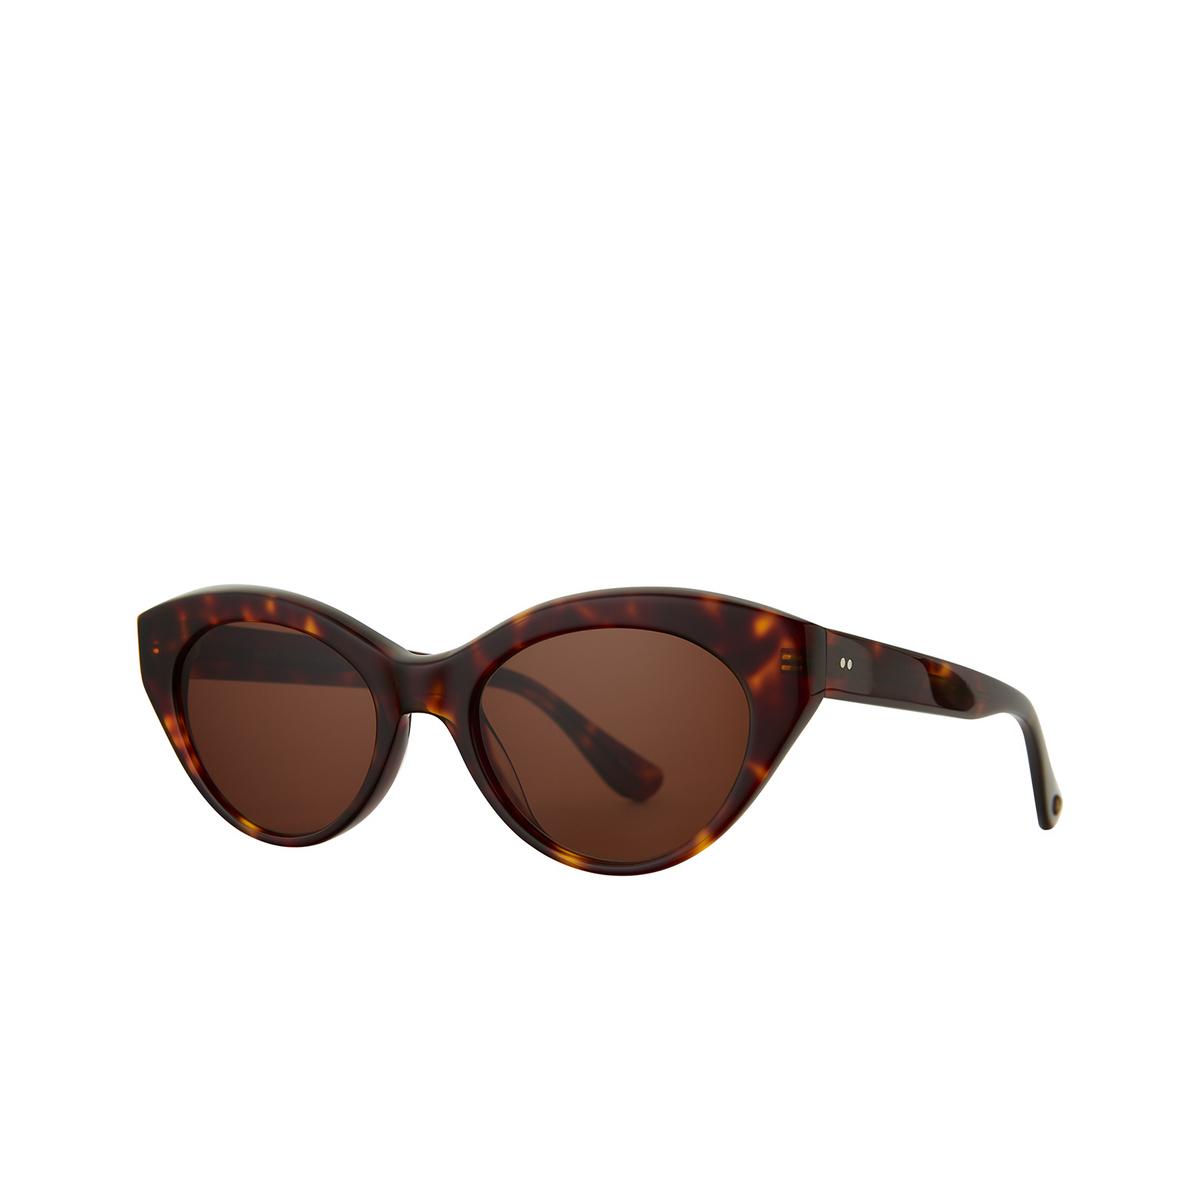 Garrett Leight® Cat-eye Sunglasses: Juvee Sun color 1965 Tortoise 1965TO/O.